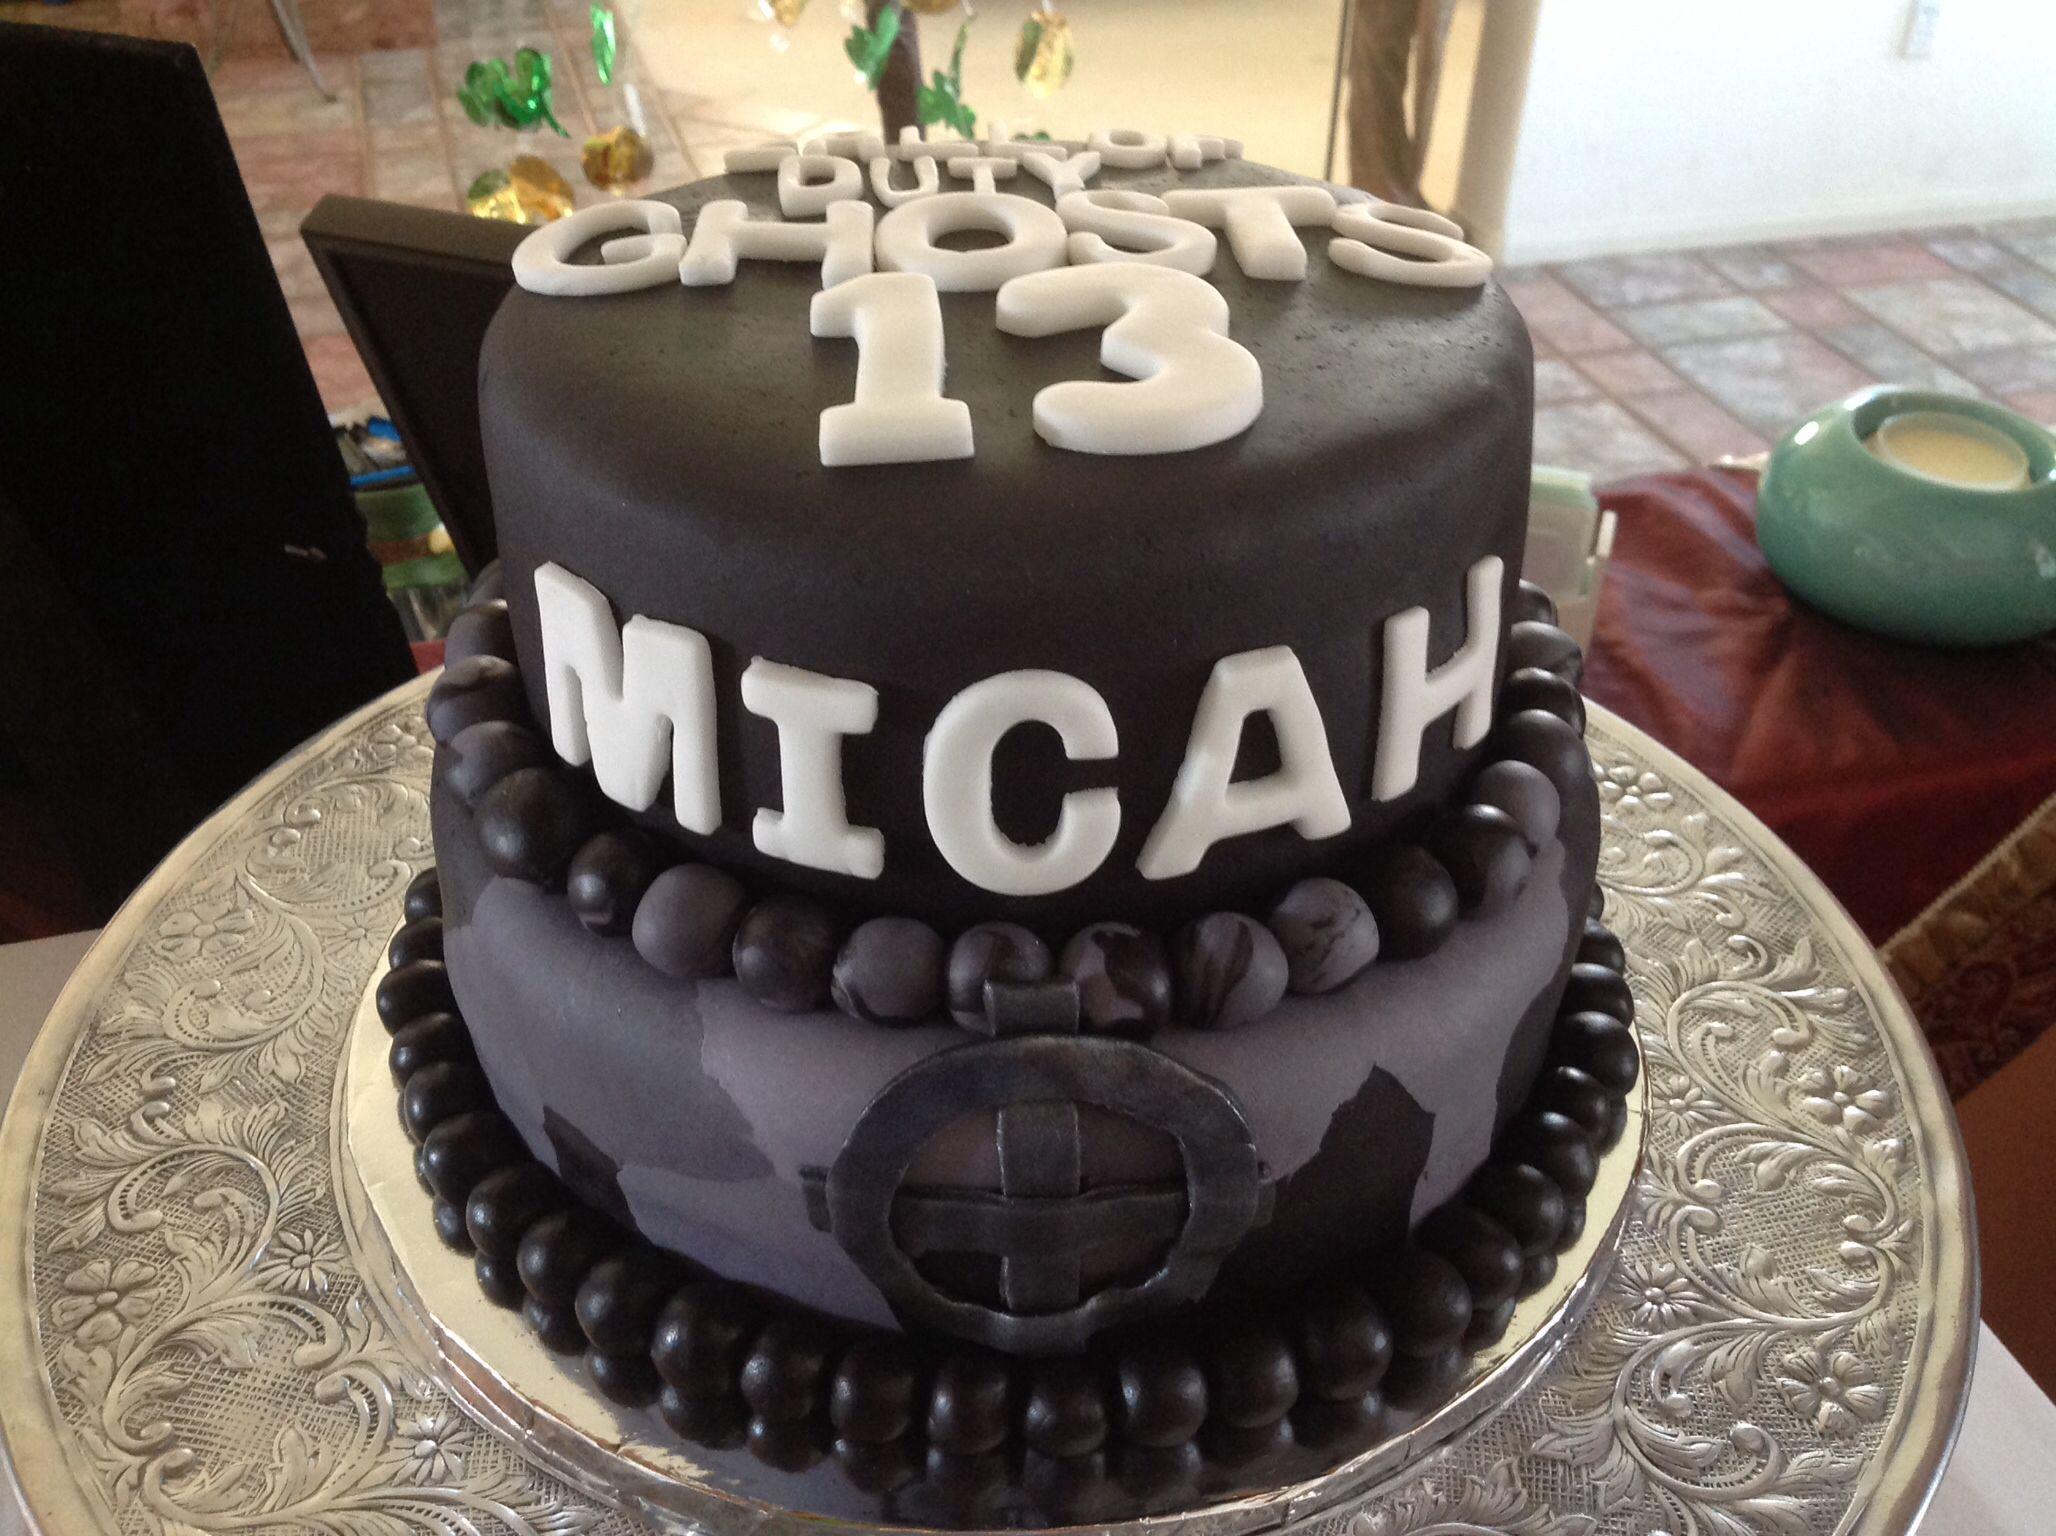 Call of Duty Ghosts Cake for boys birthday. Chocolate cake